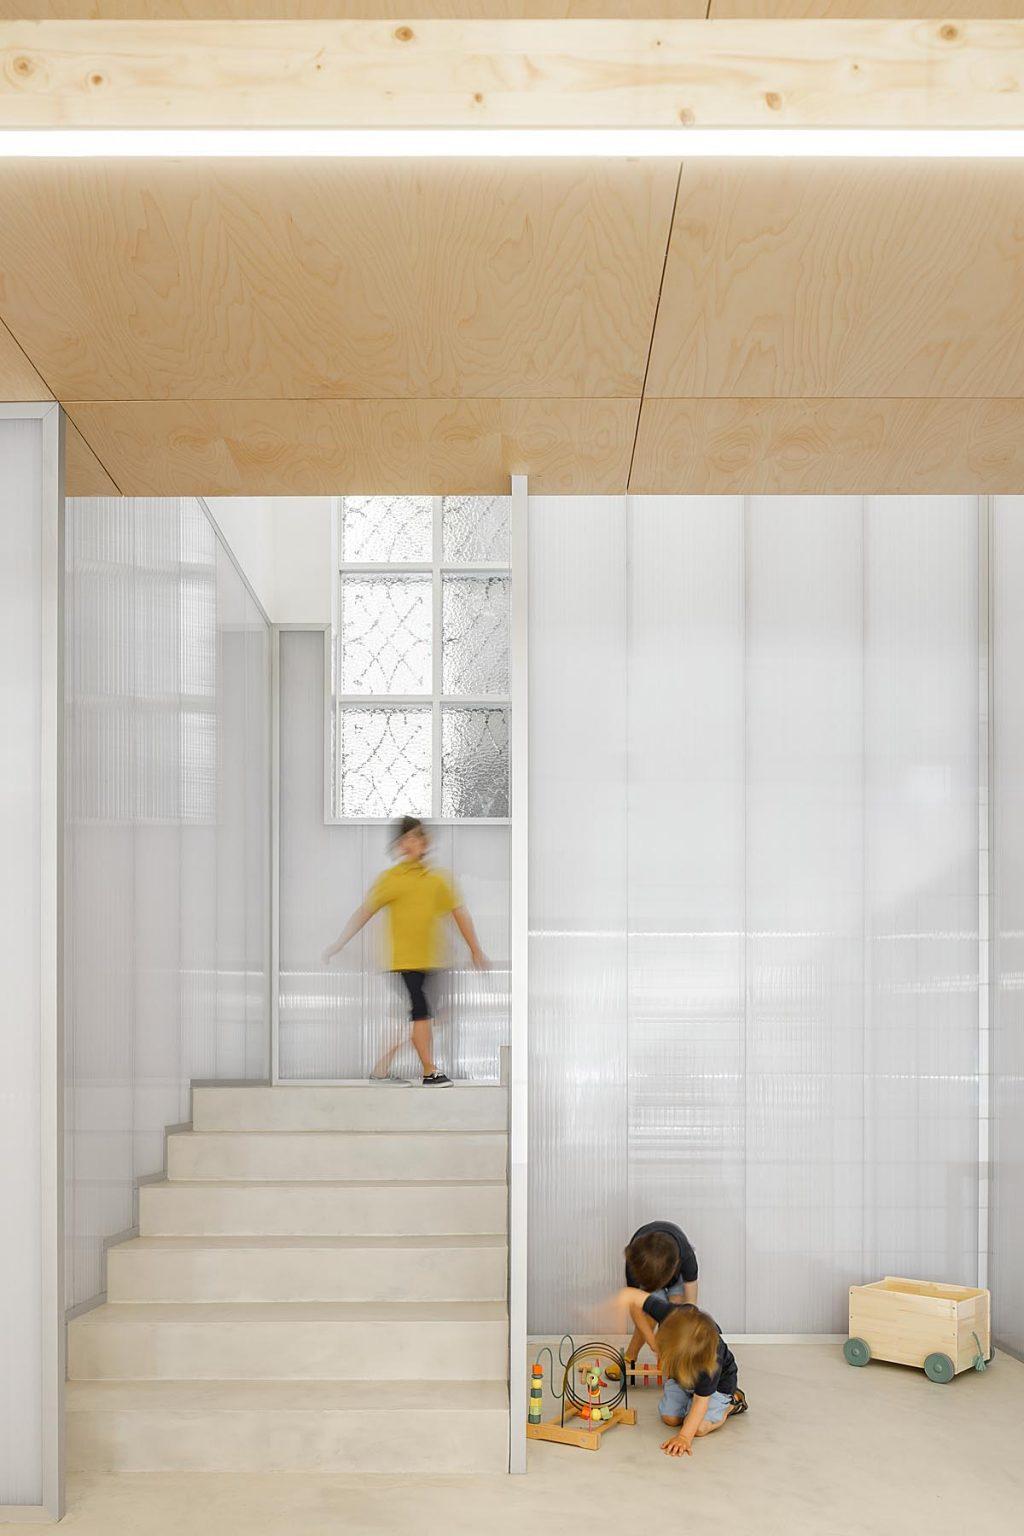 Morinha children's clothing store, Oficina de Arquitectura and Design Stu.dere